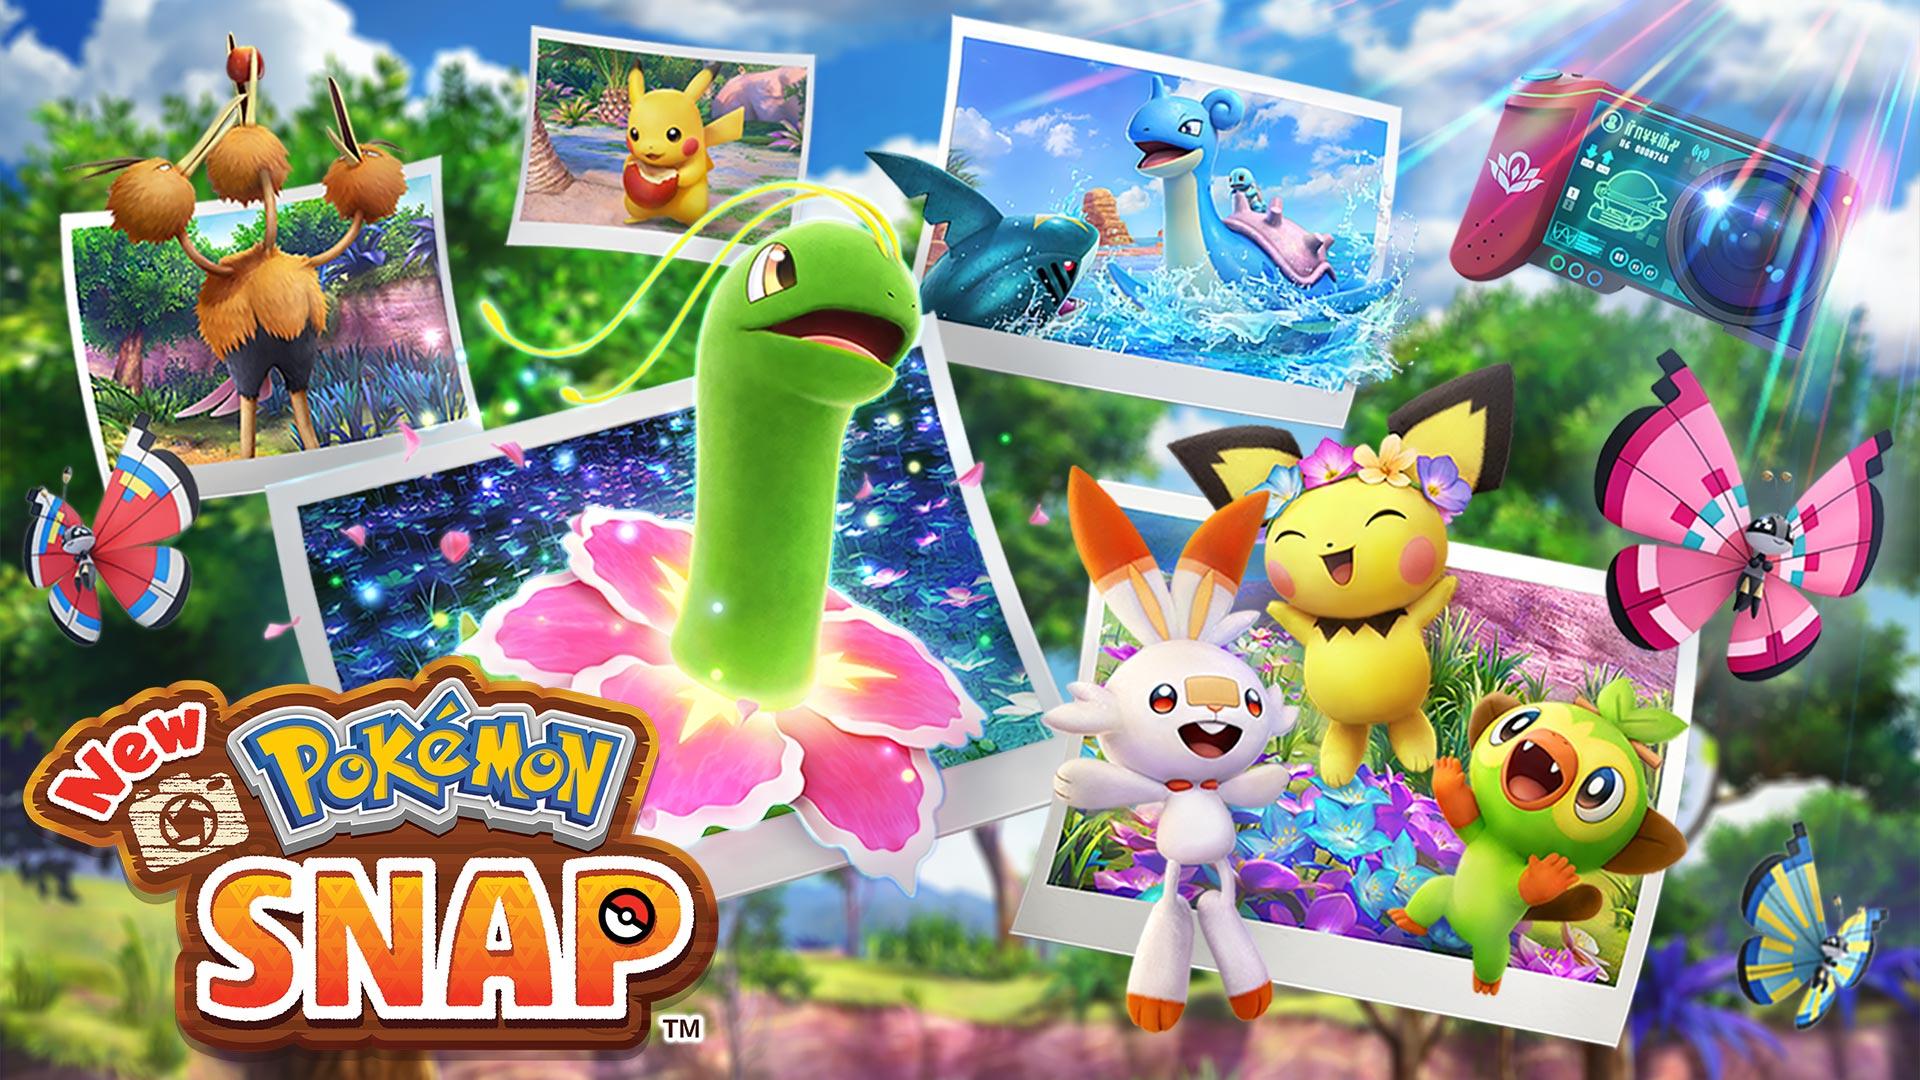 New Pokémon Snap /Nintendo Switch/eShop Download